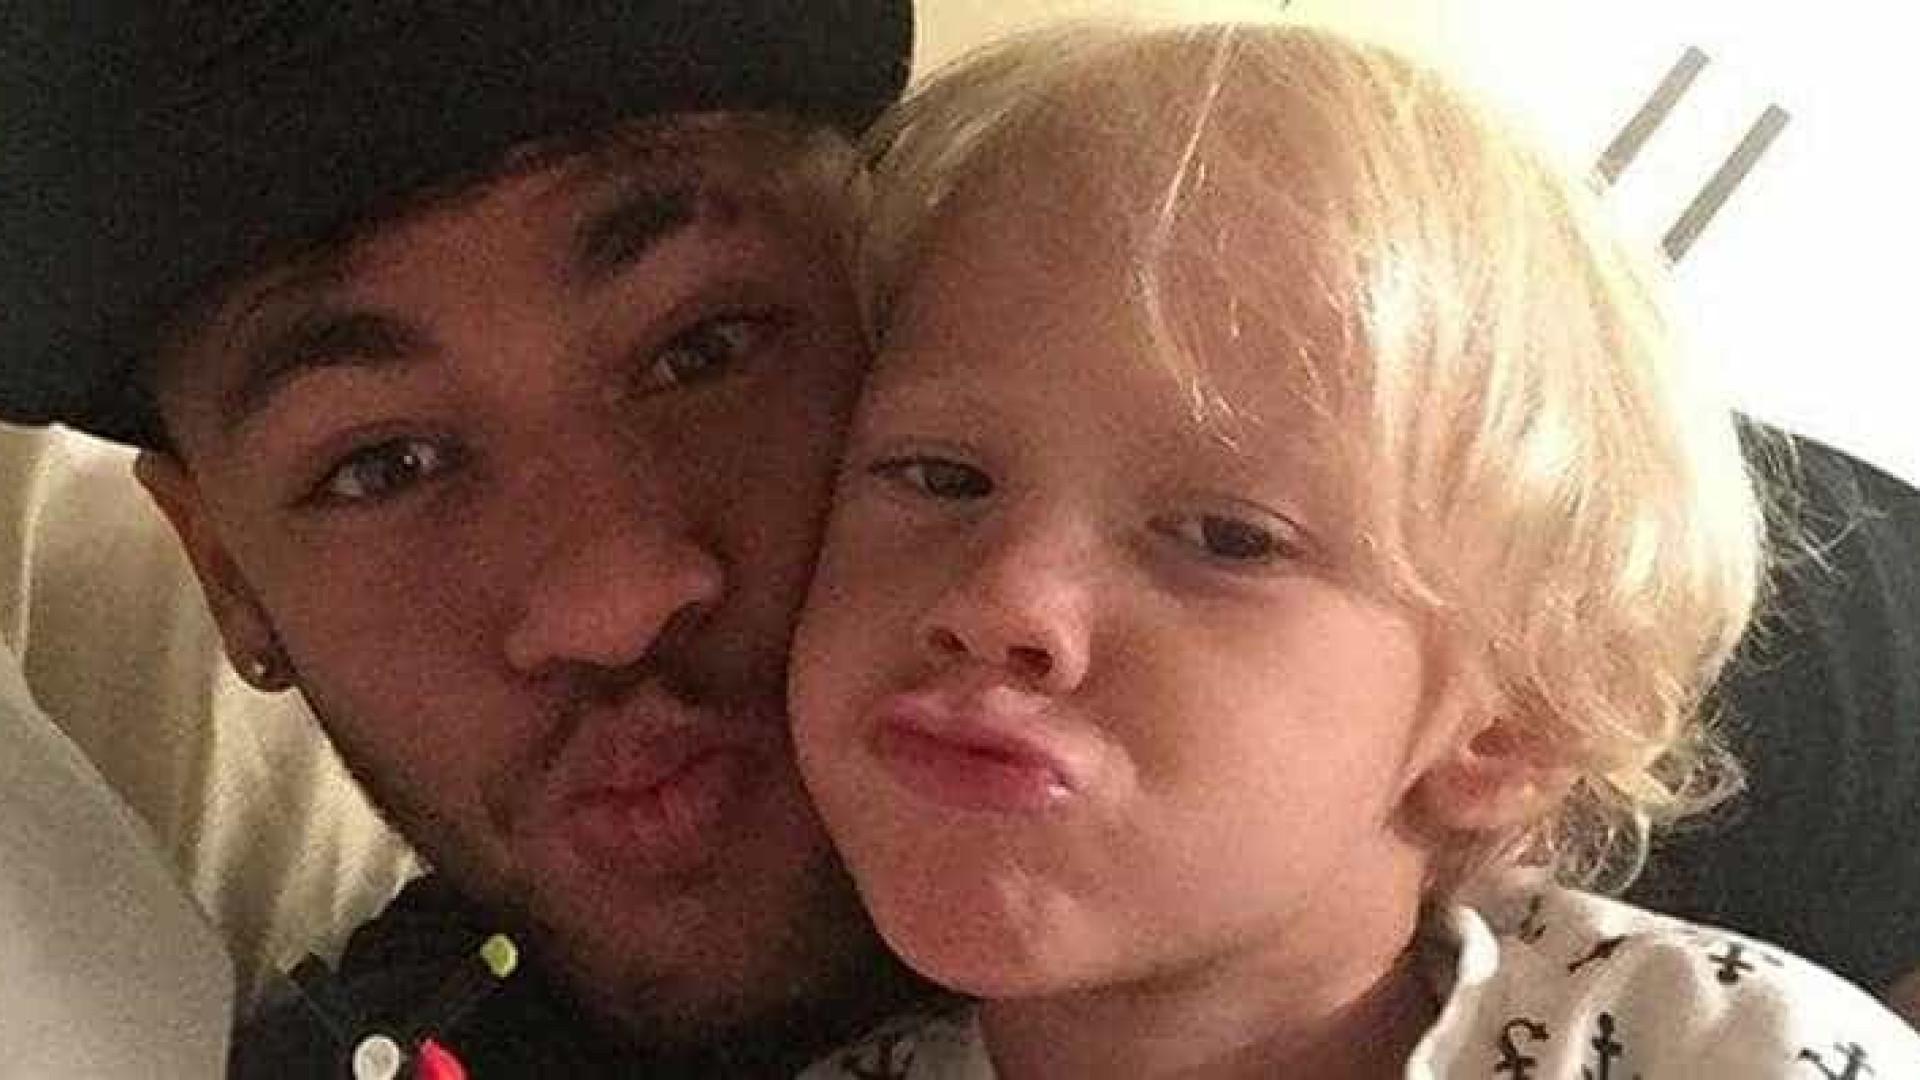 Neymar aproveita folga para curtir o filho; veja